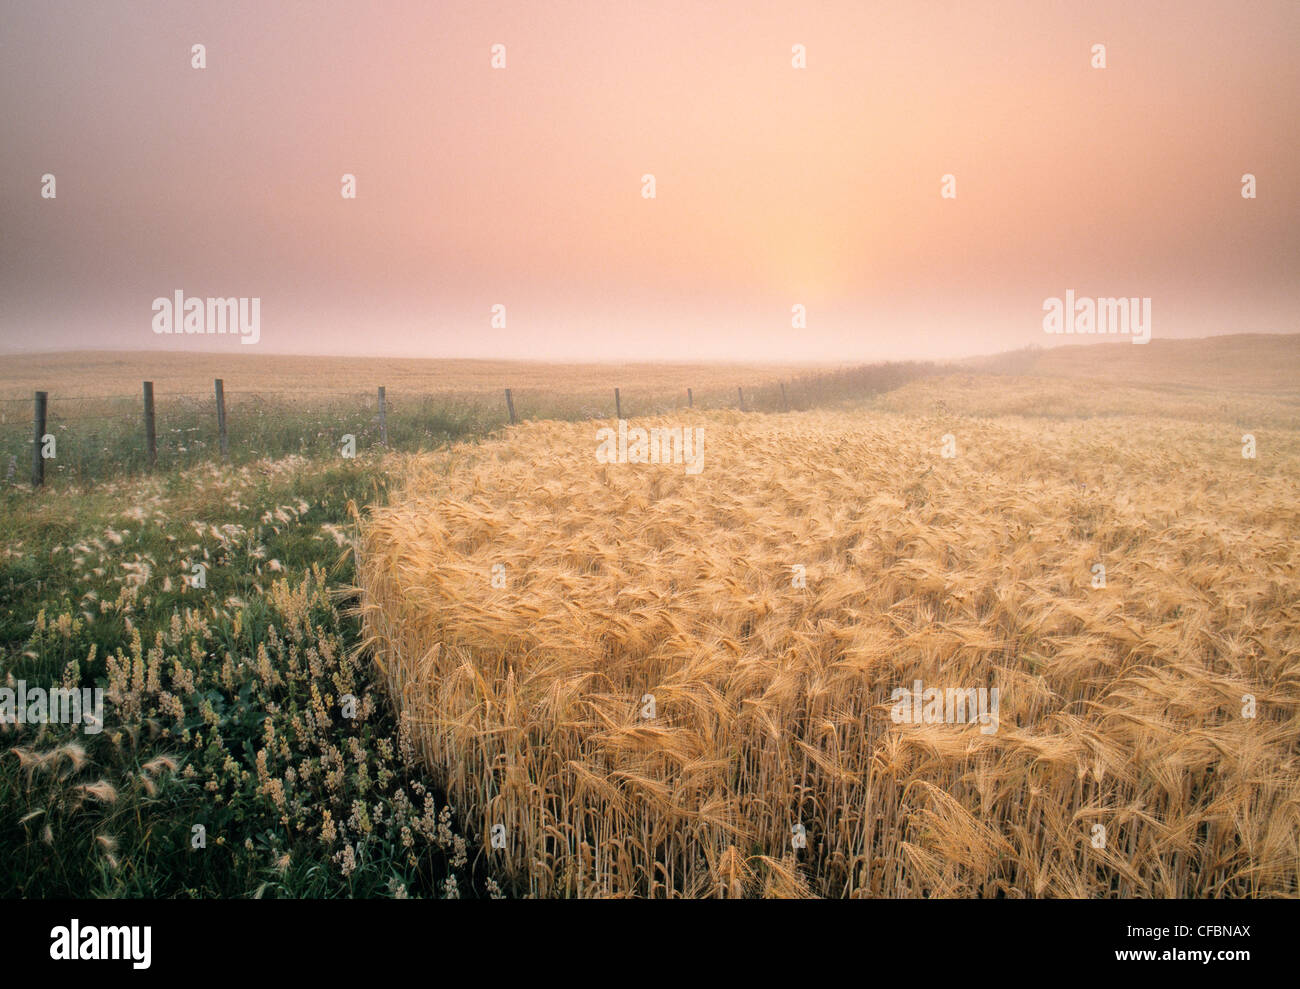 Barley crop and fence near Holland, Manitoba, Canada - Stock Image